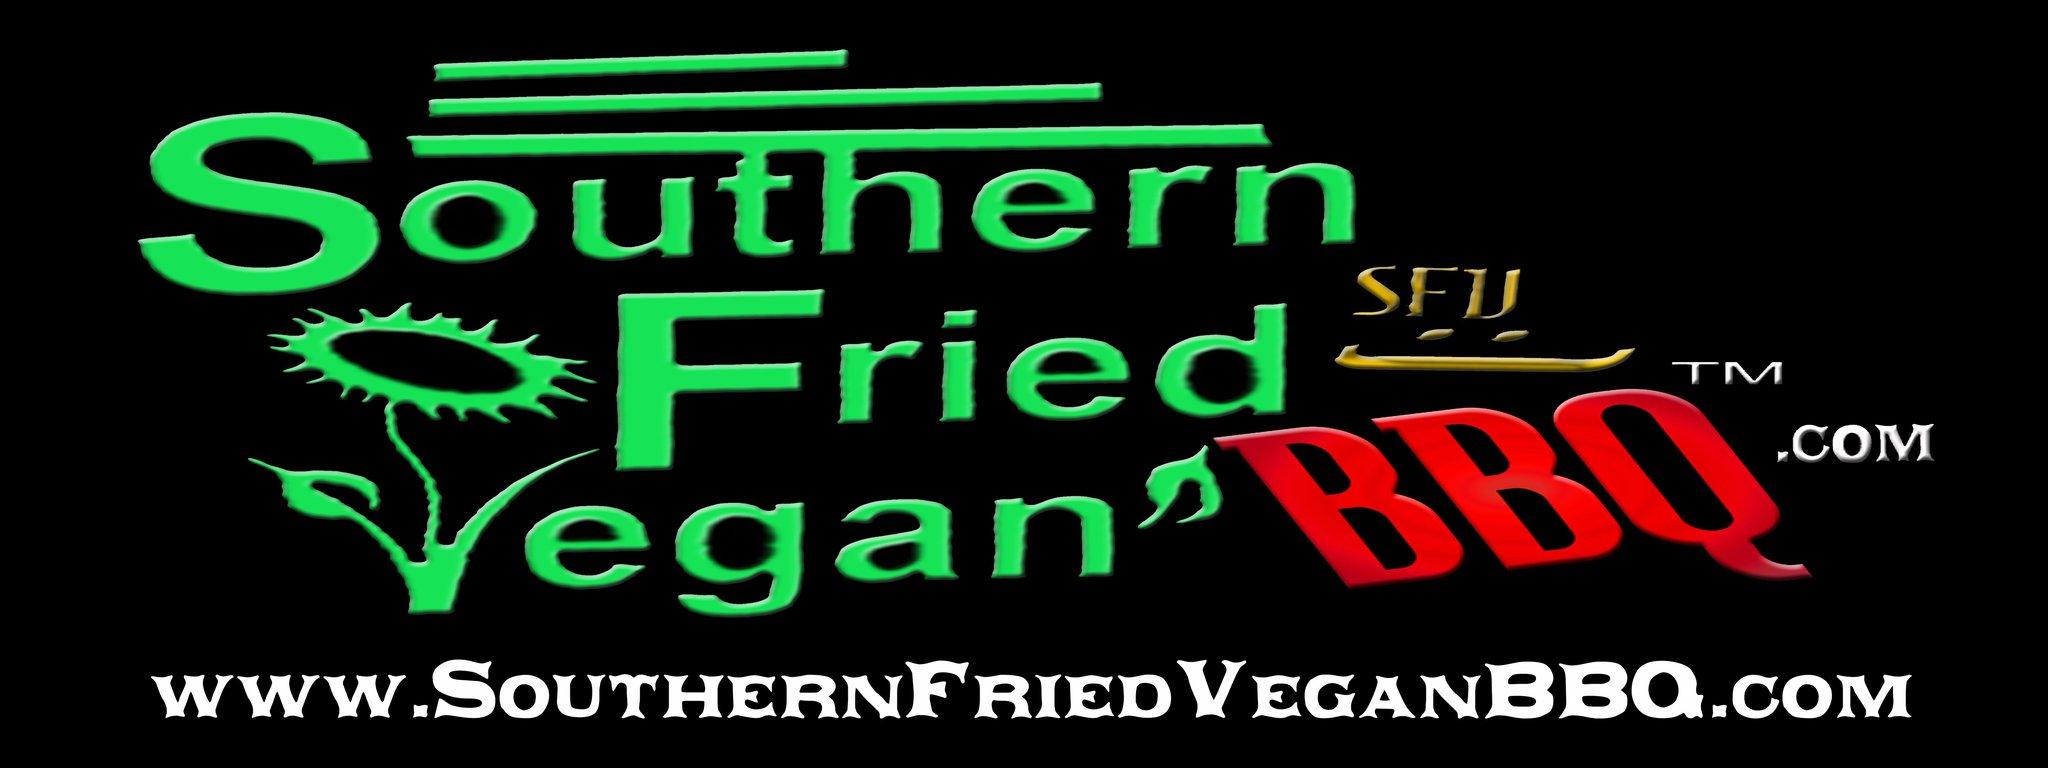 Southern Fried Vegan